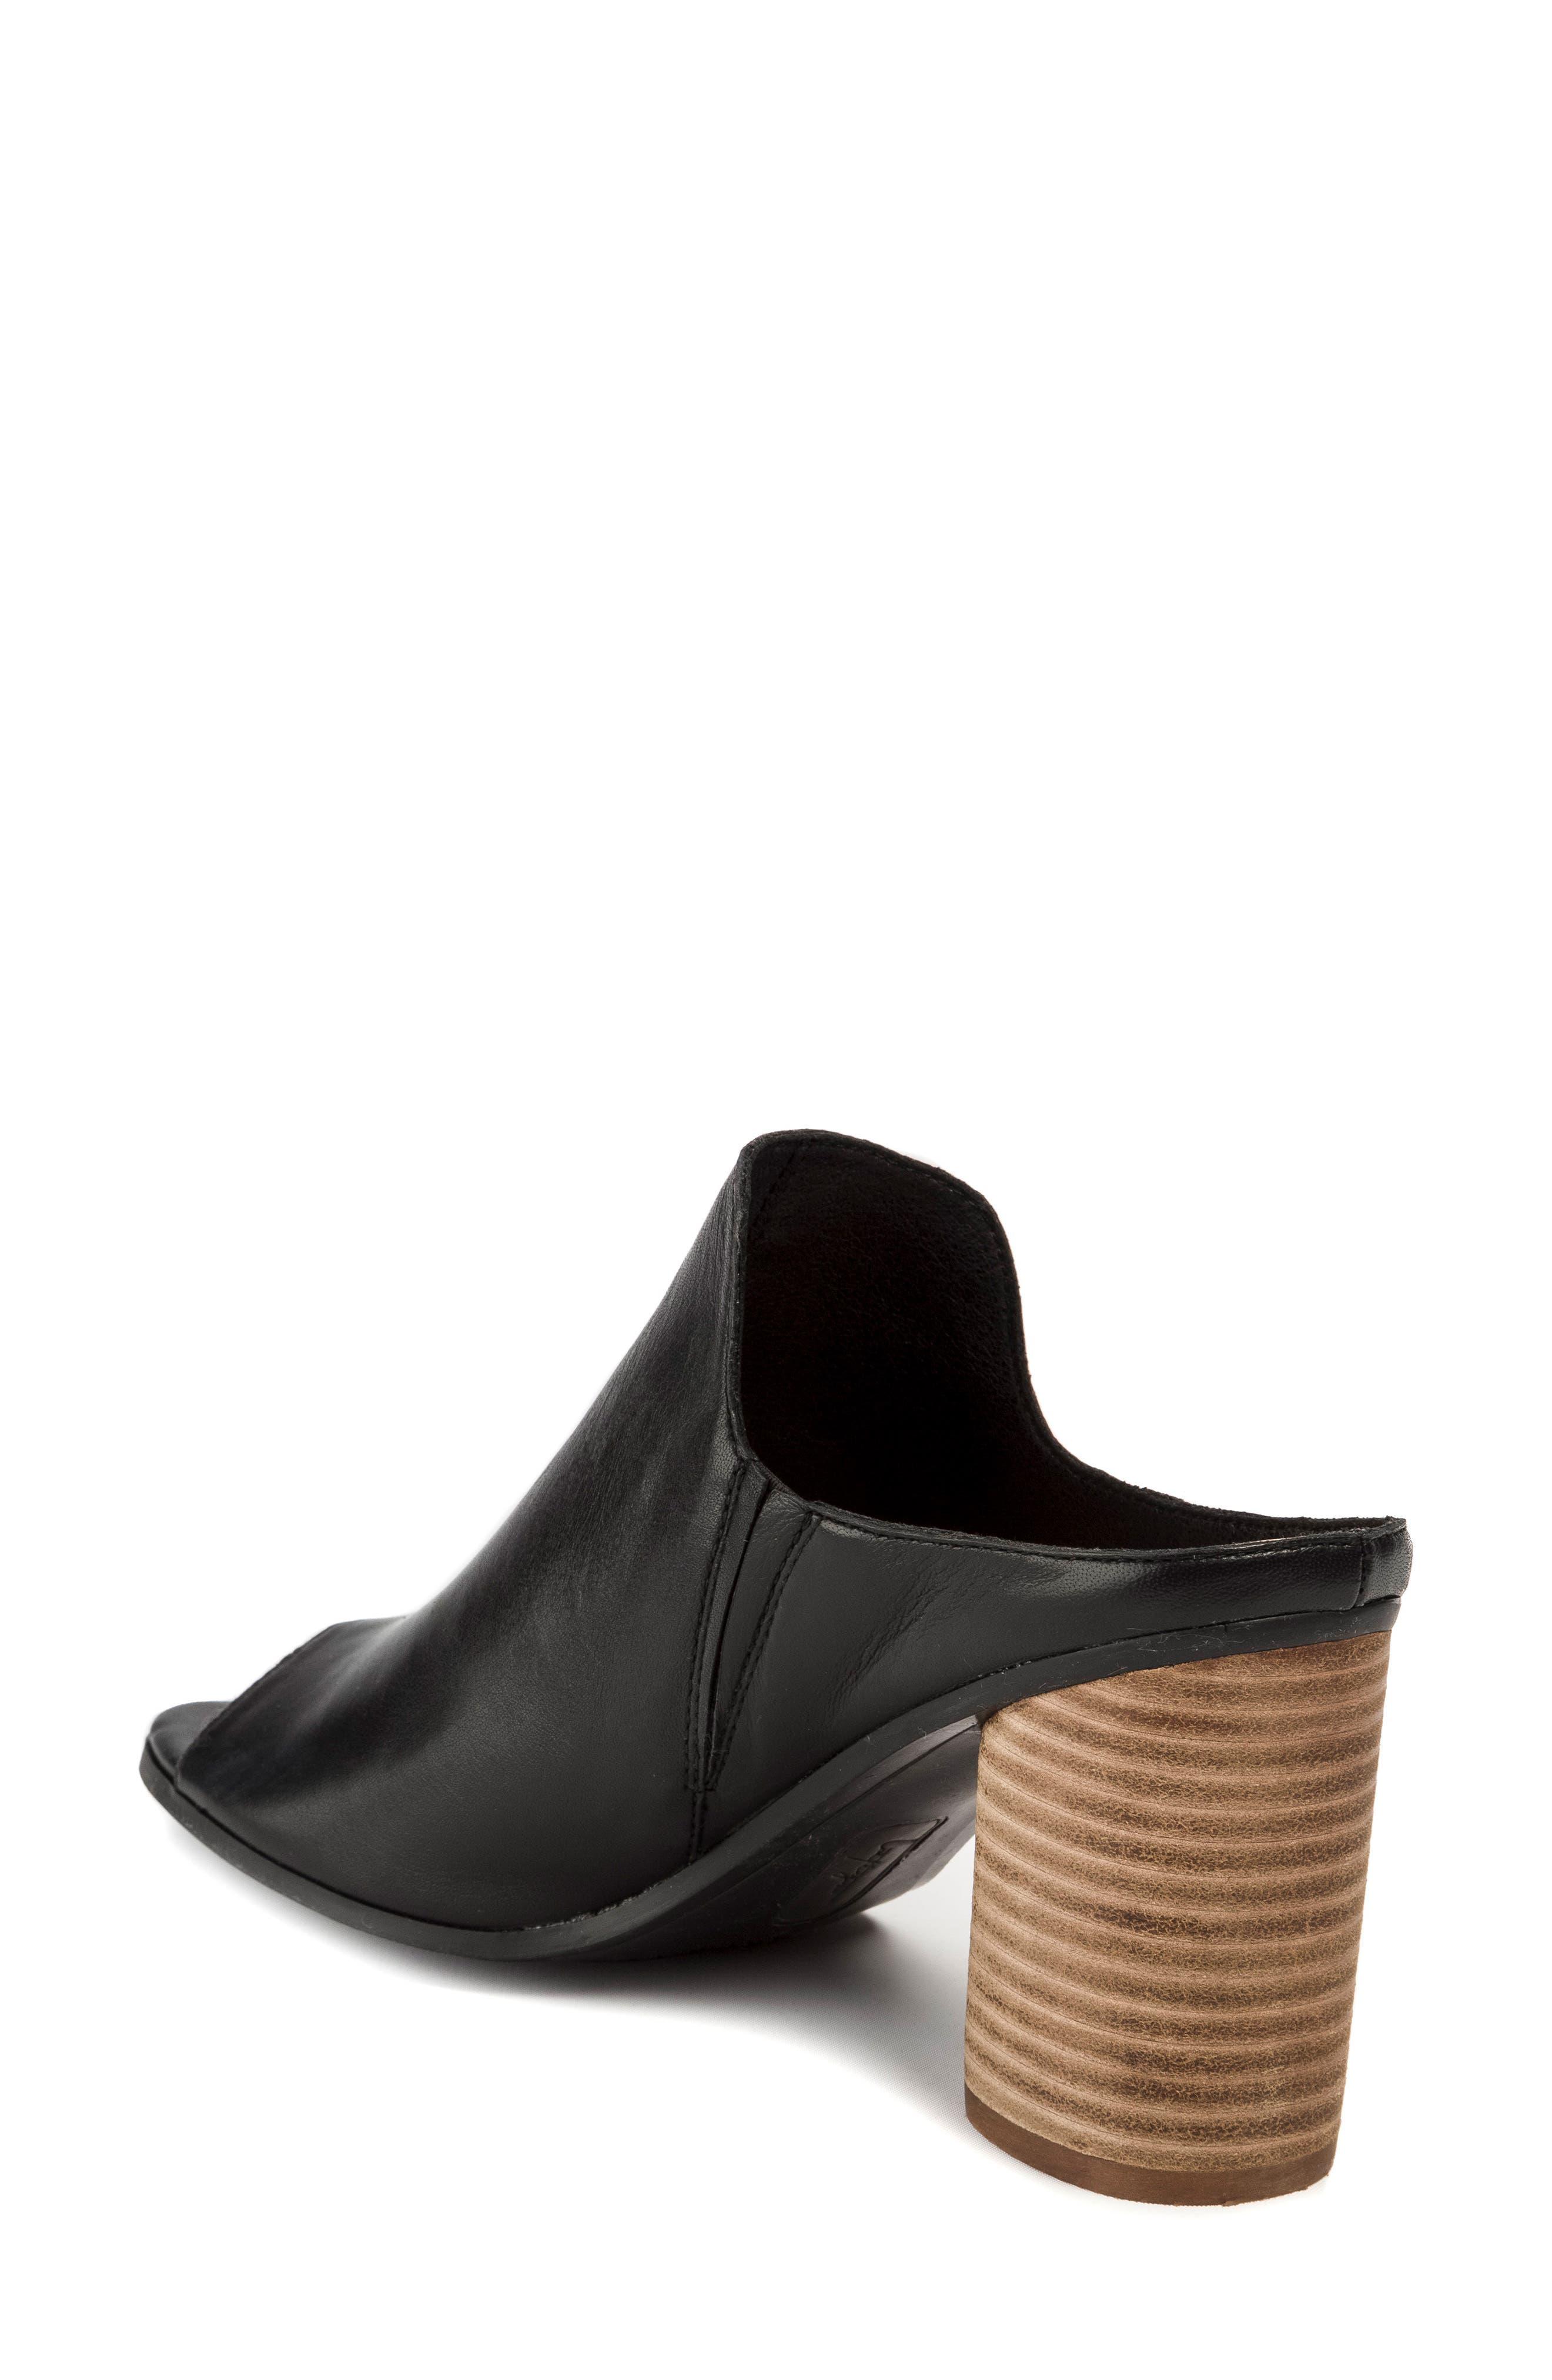 Hallie Loafer Sandal,                             Alternate thumbnail 2, color,                             001